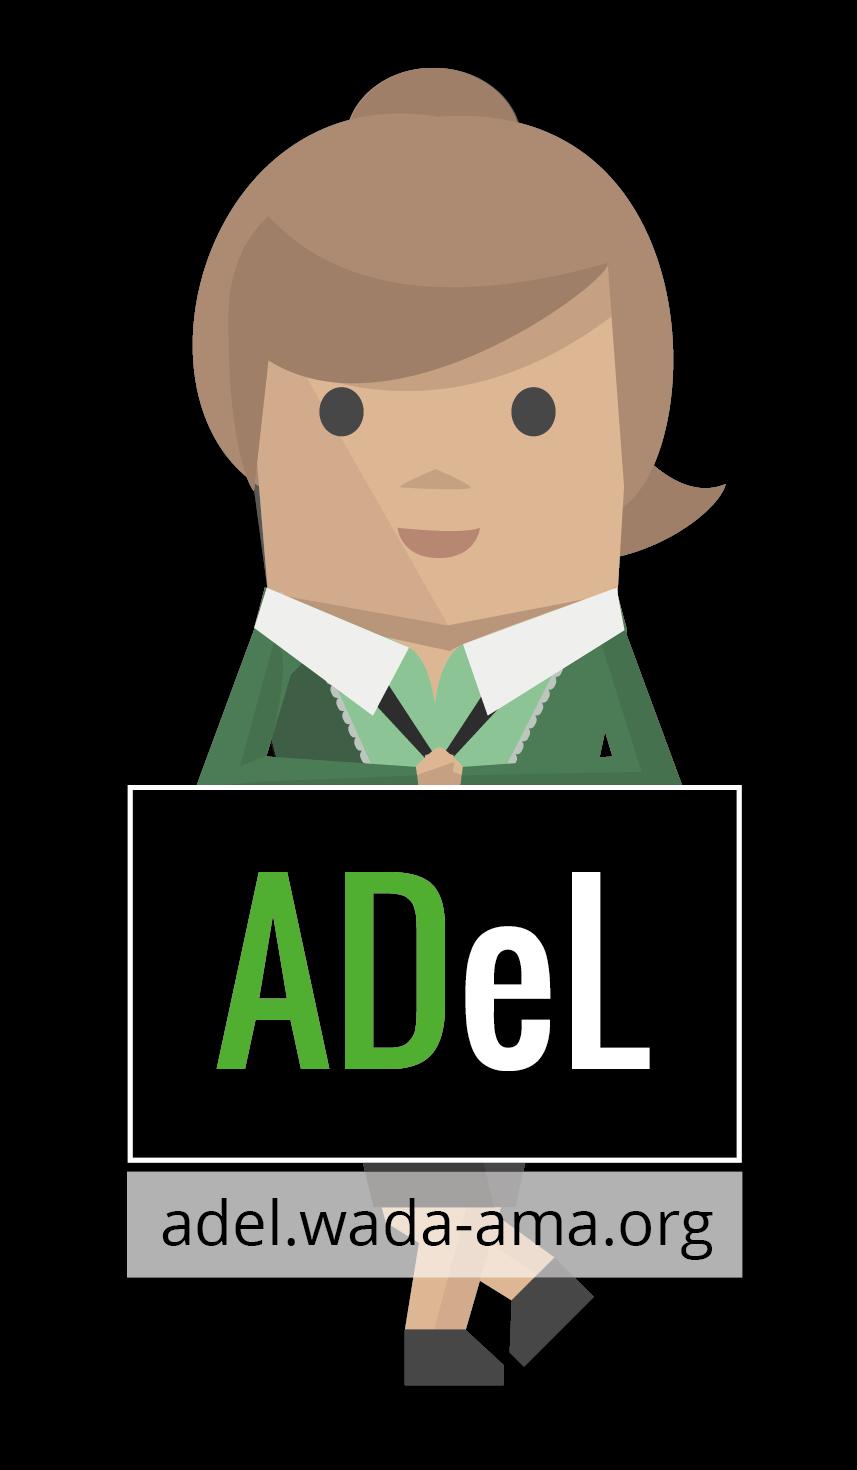 WADA's anti-doping eLearning platform (ADeL)